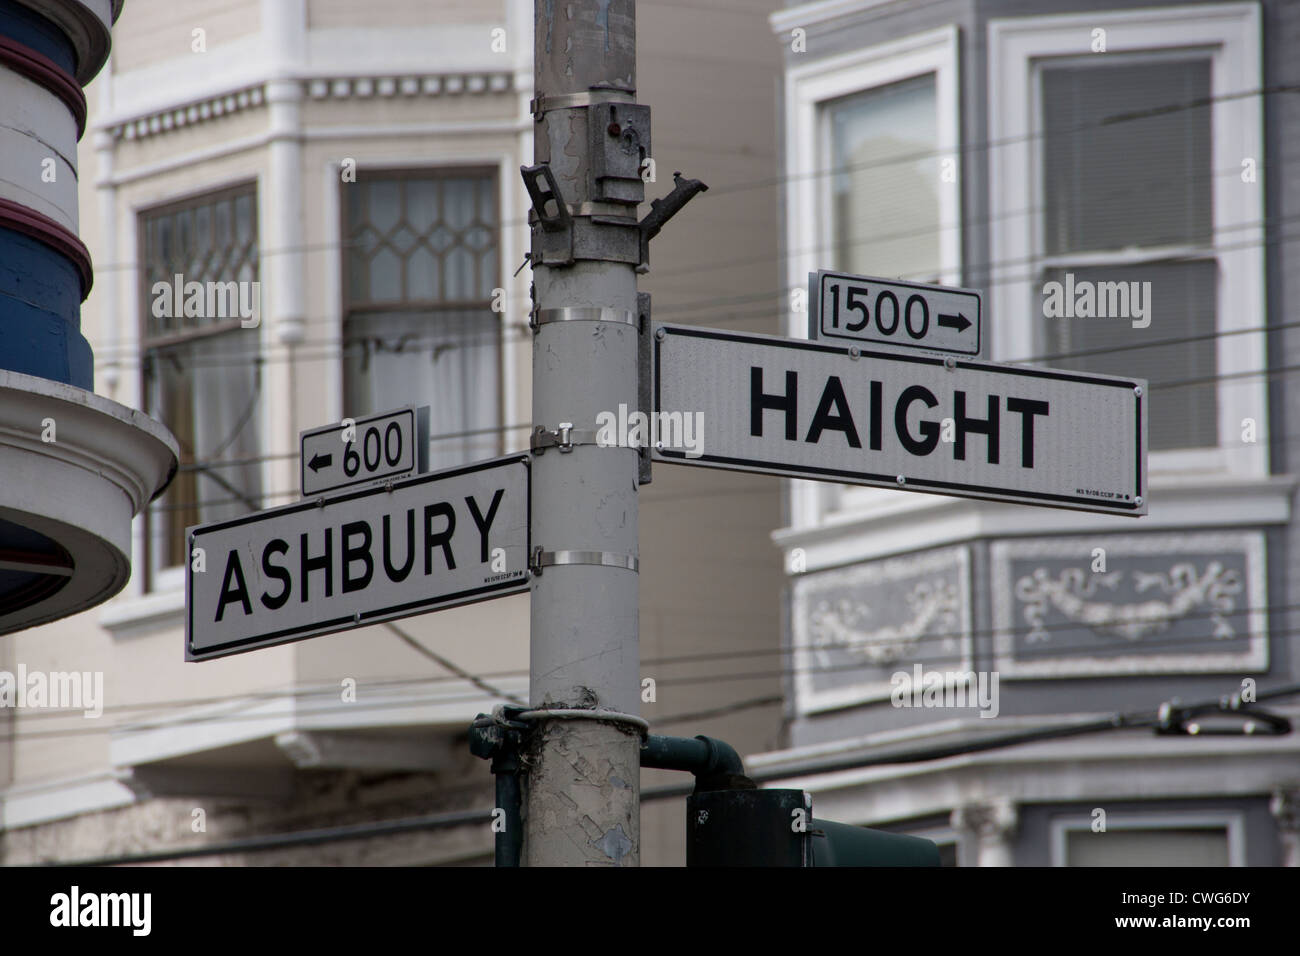 Haight Ashbury street sign - Stock Image